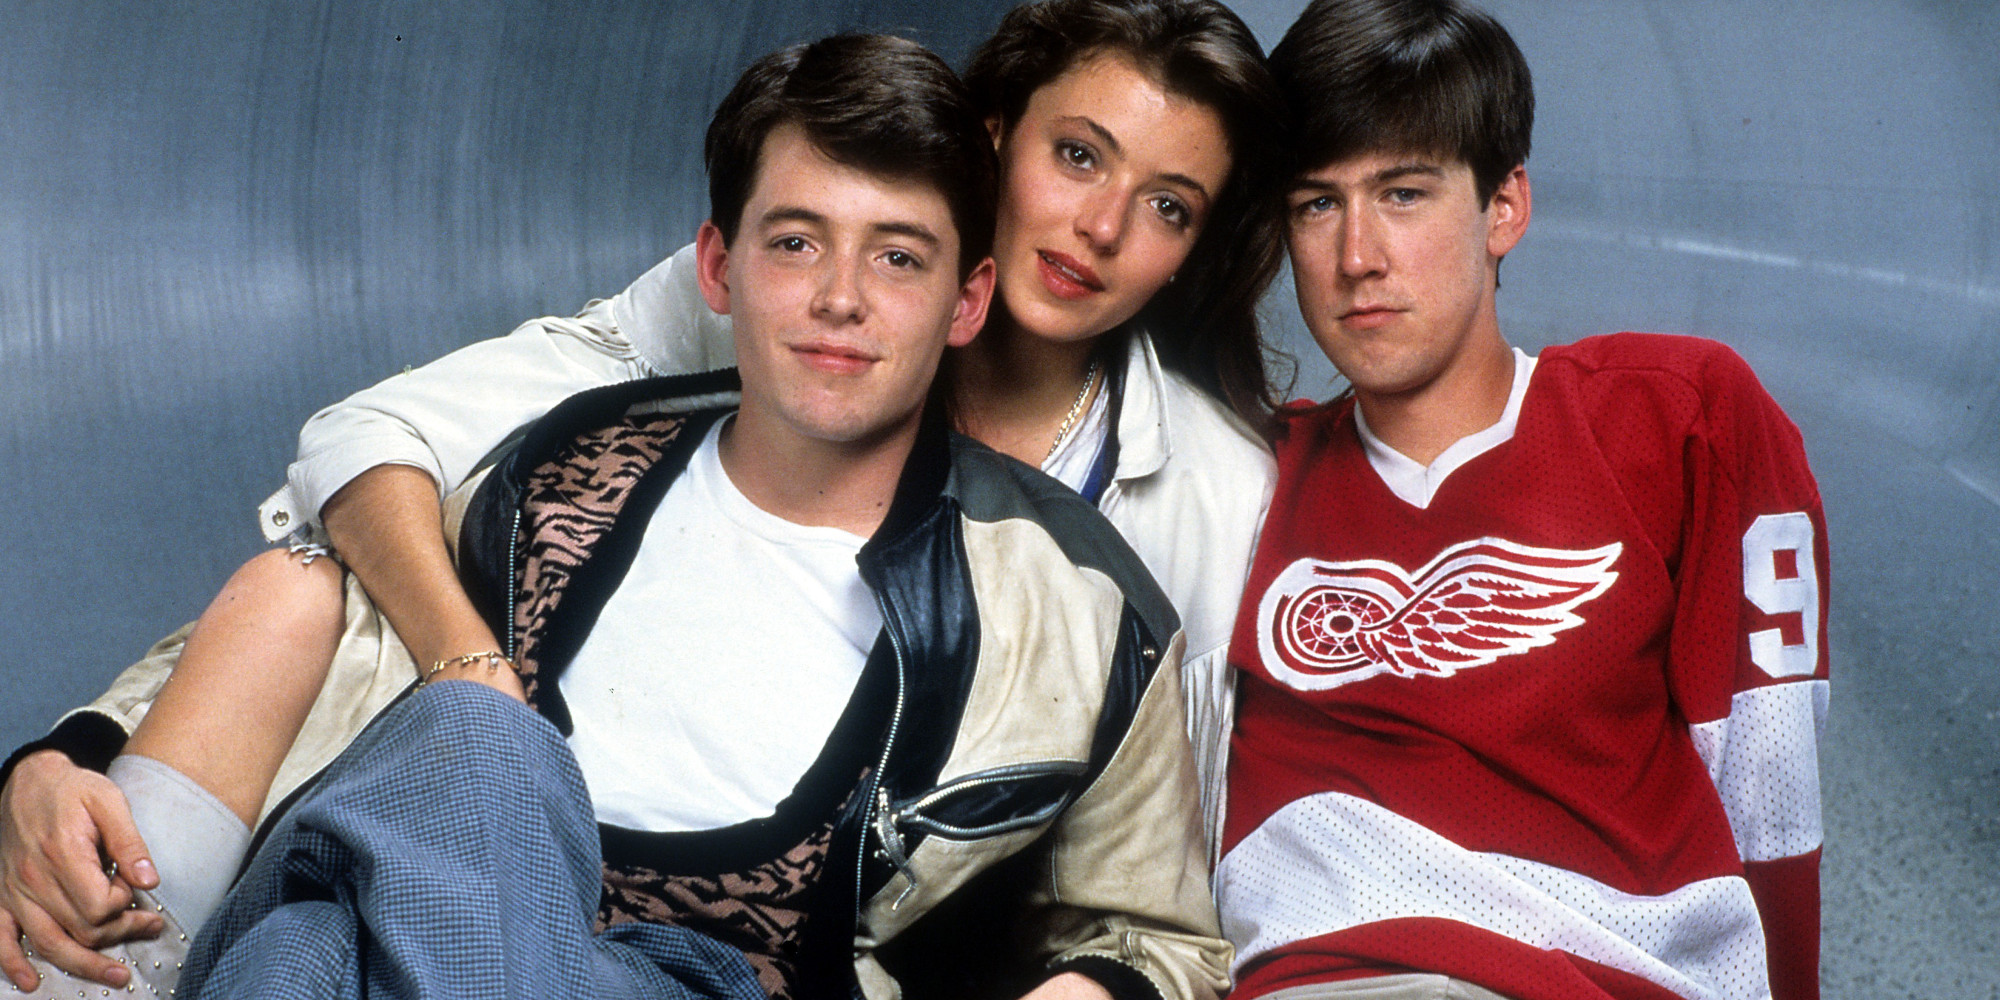 Matthew Broderick And Alan Ruck In 'Ferris Bueller's Day Off'